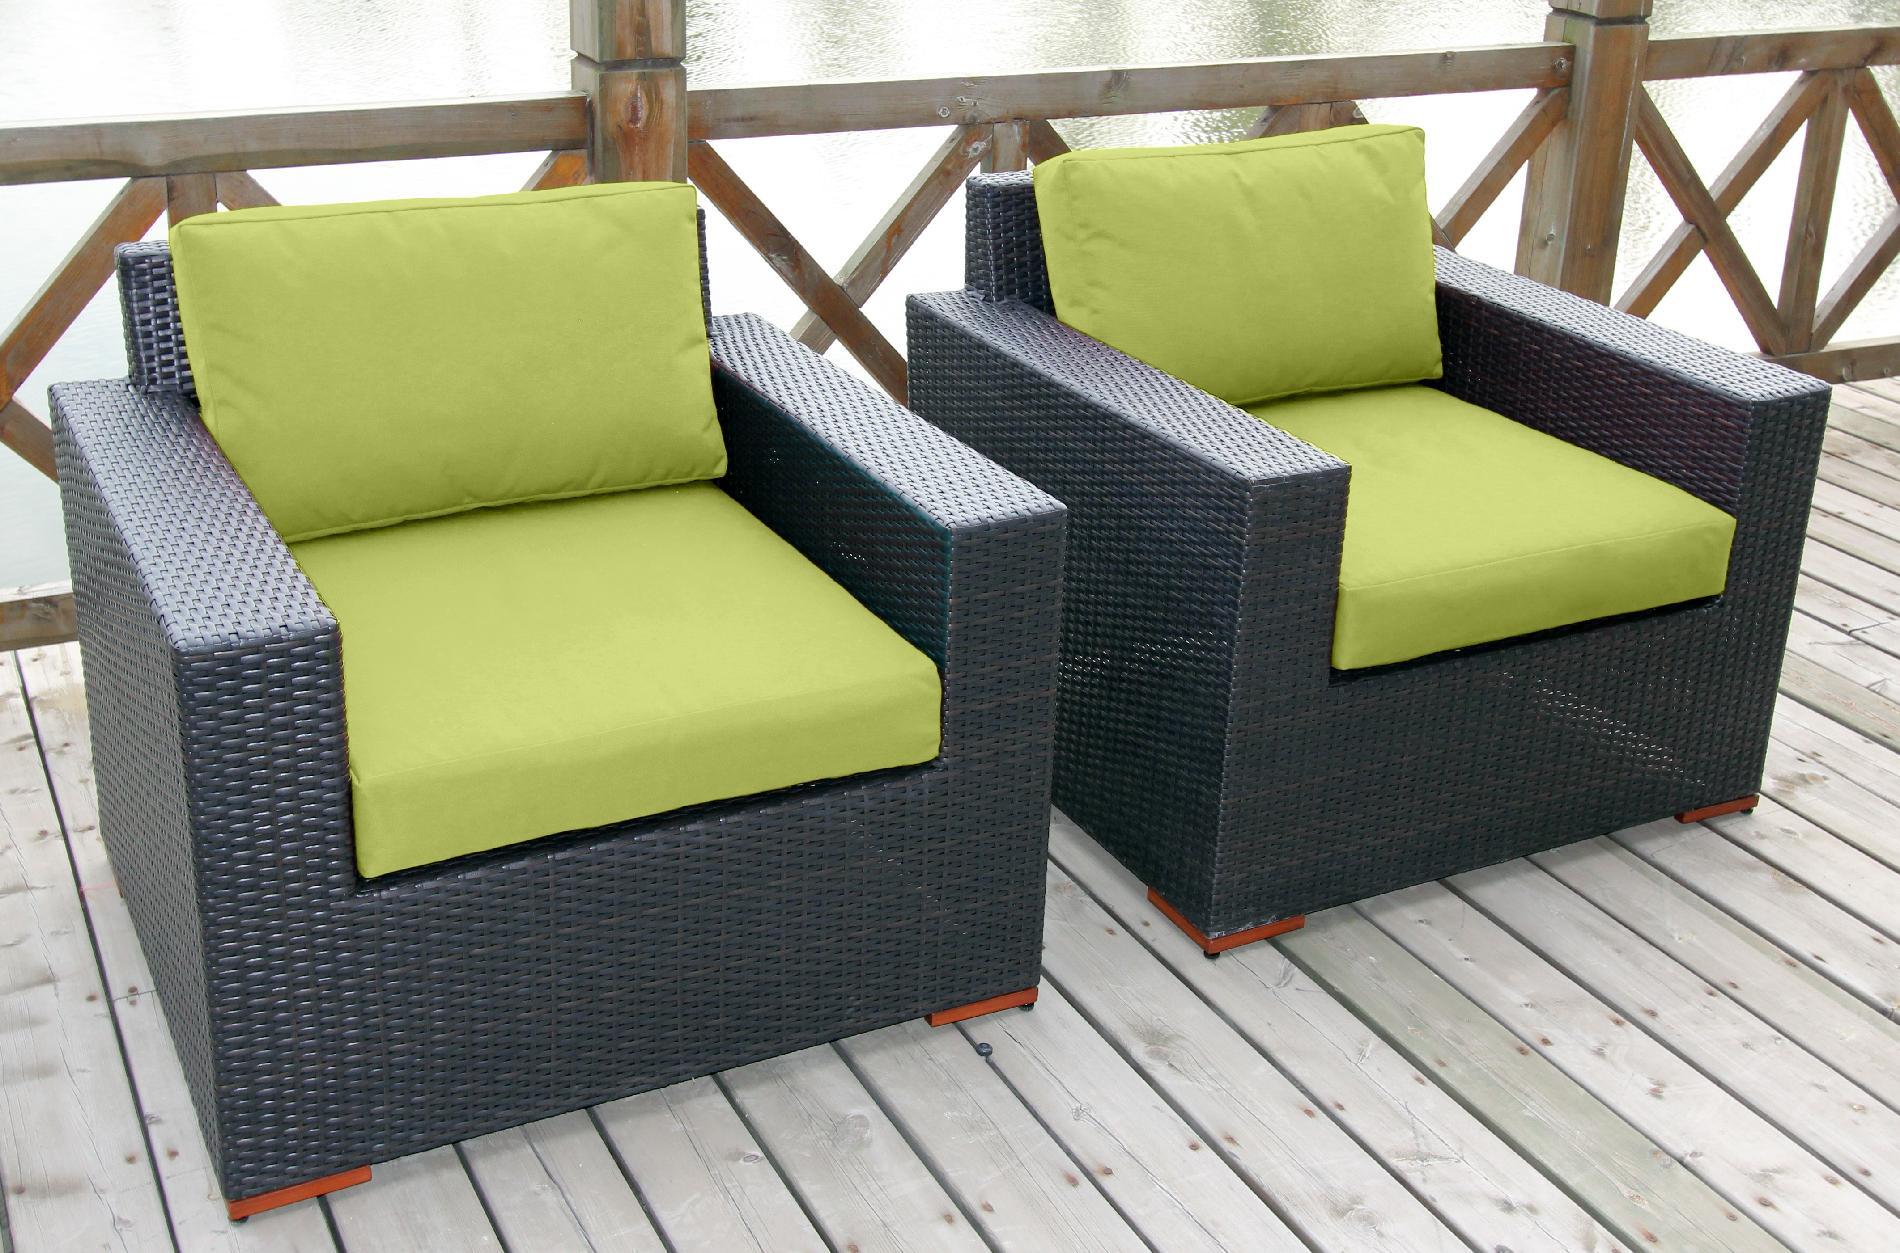 patio club chair balancing ball bellini home and gardens wildon deep seating chairs 2pk featuring sunbrella fabric